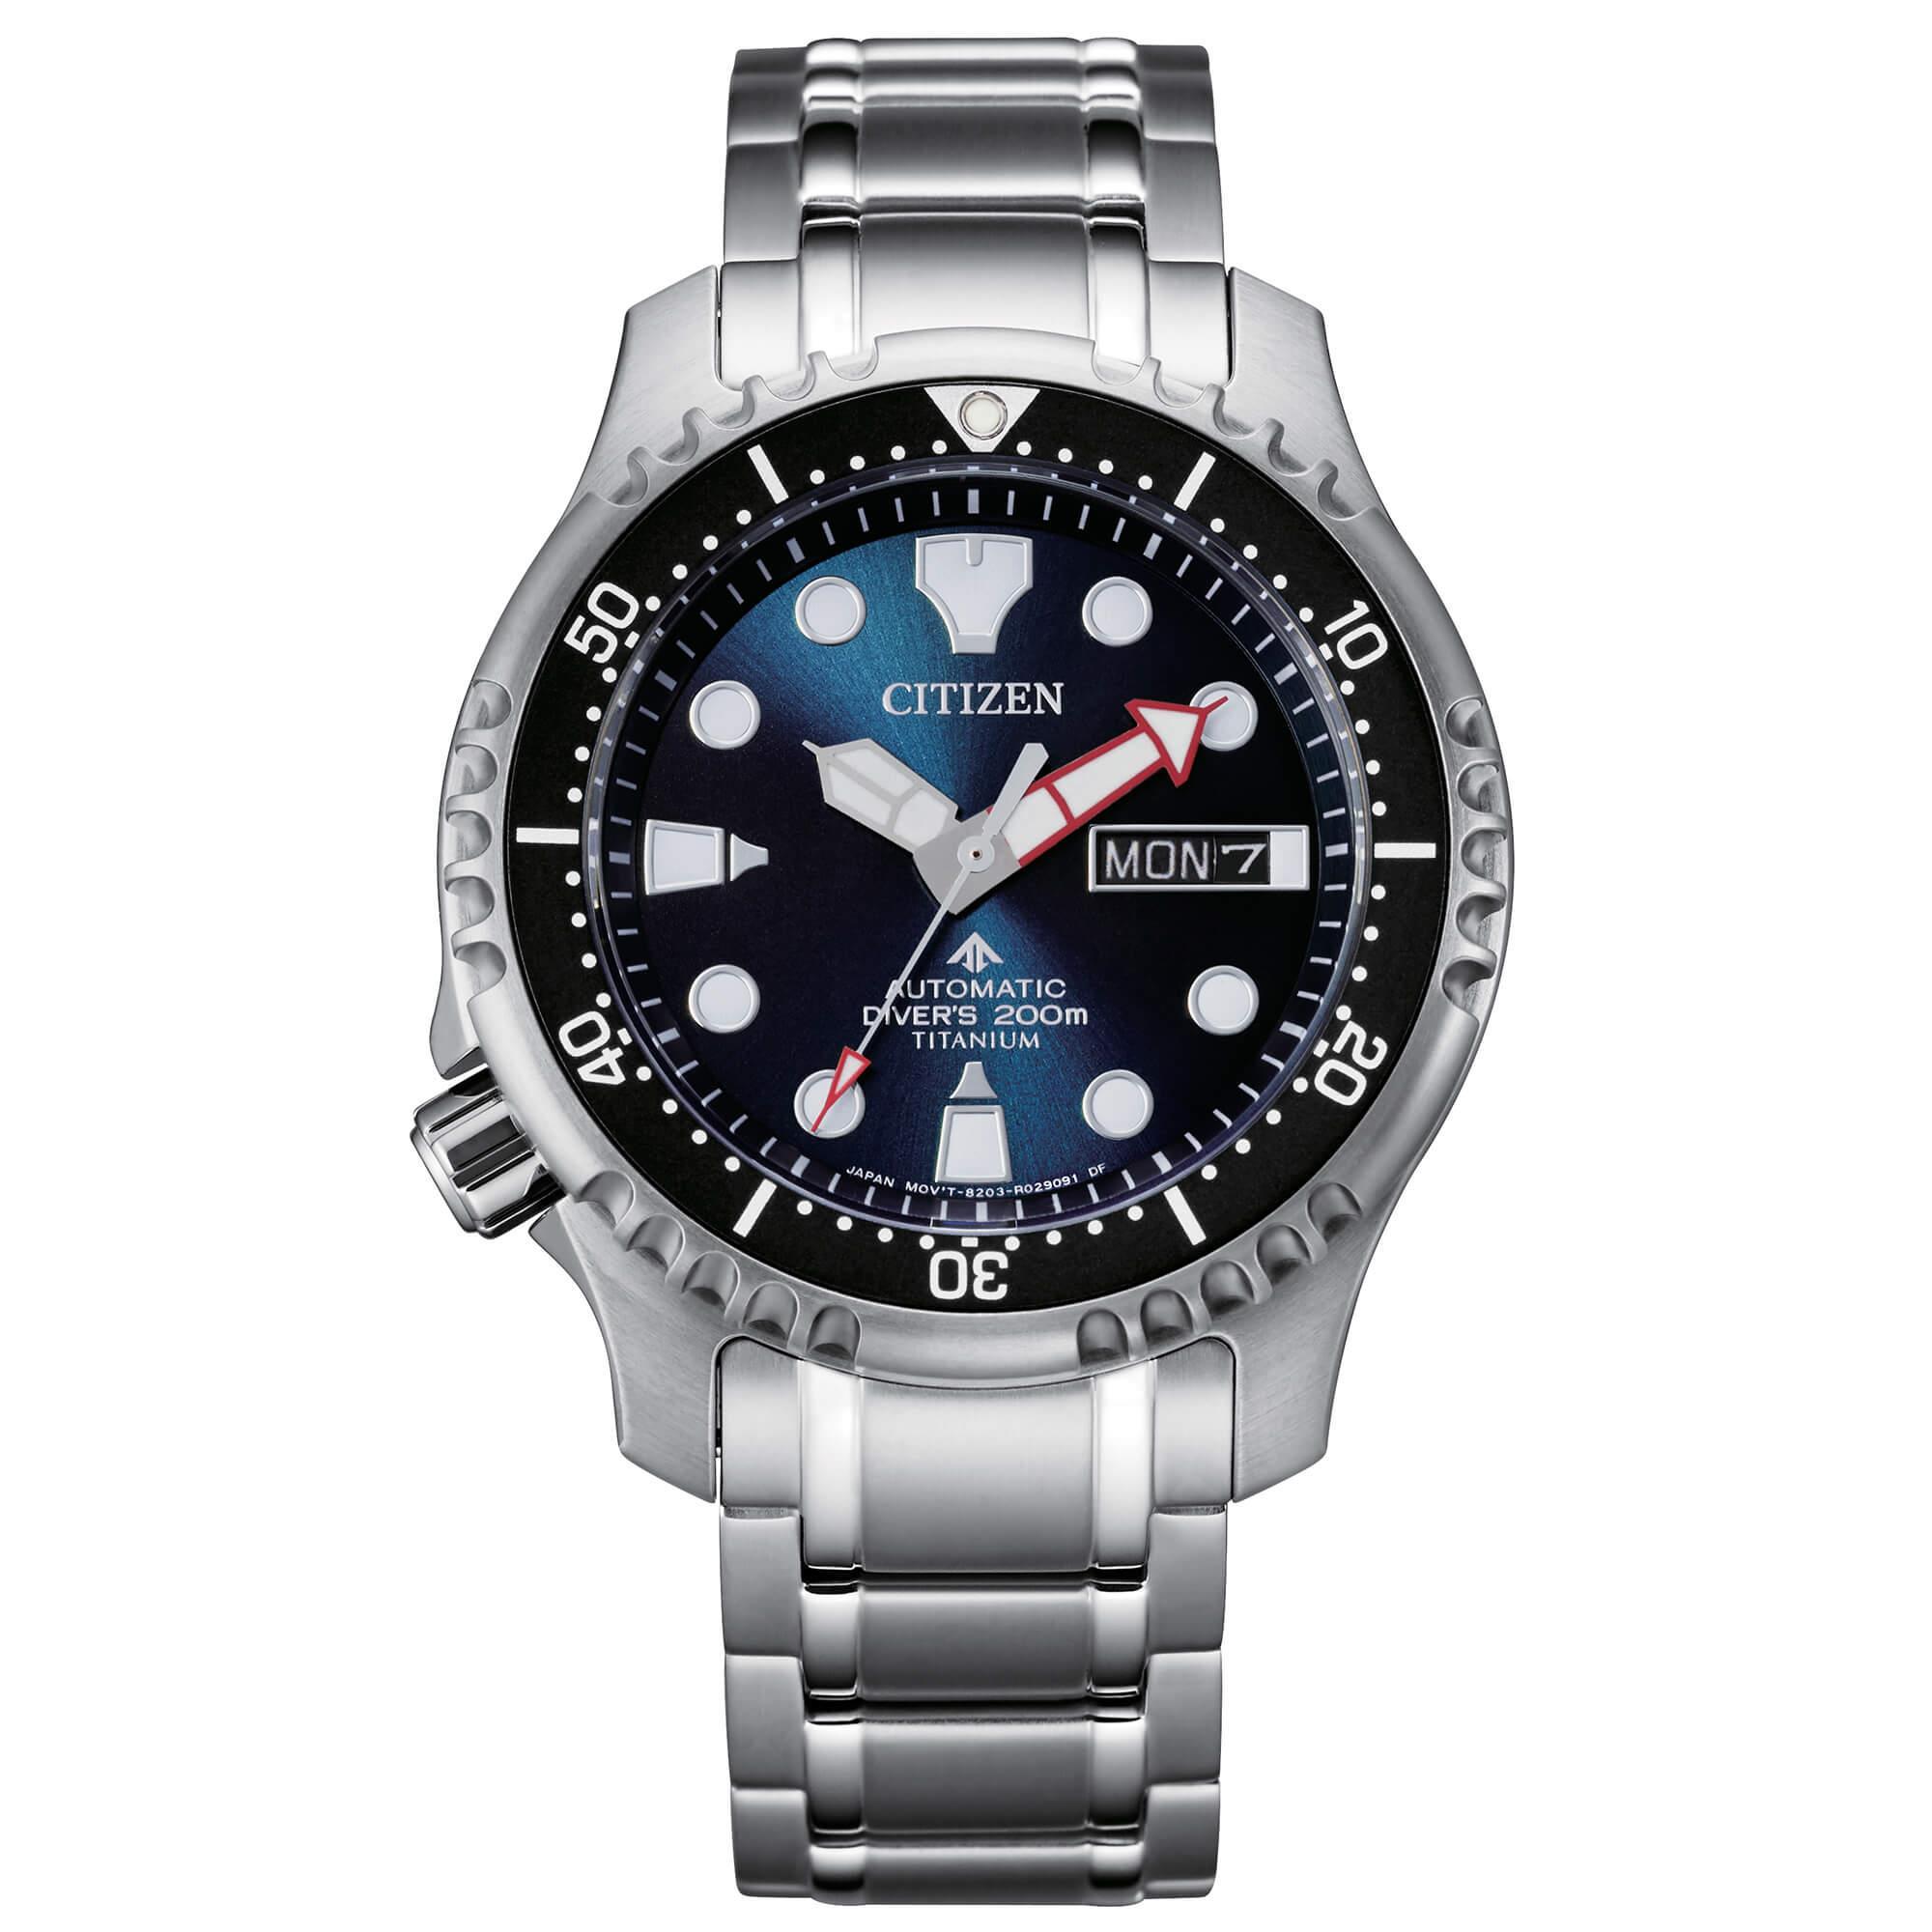 Diver's Automatic 200 mt Super Titanio Citizen - CITIZEN